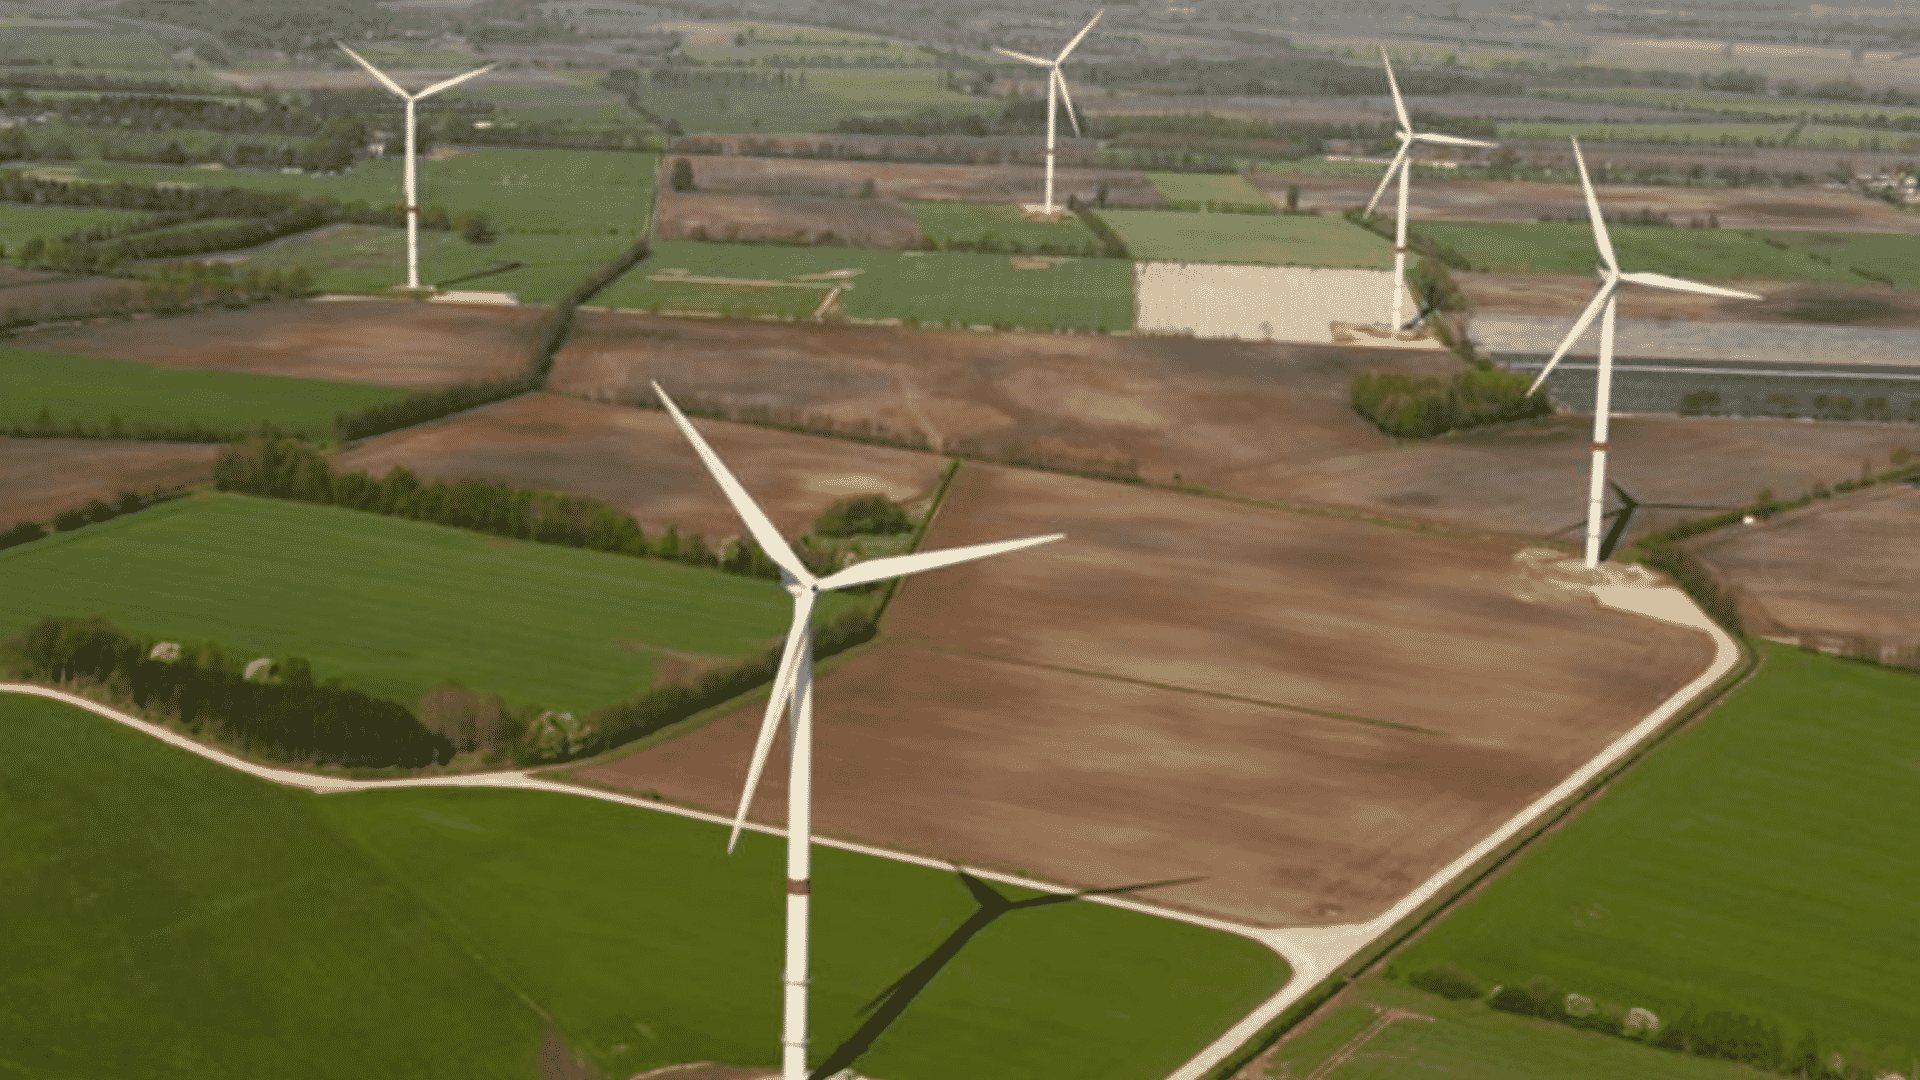 Parque eólico – Itália - turbinas